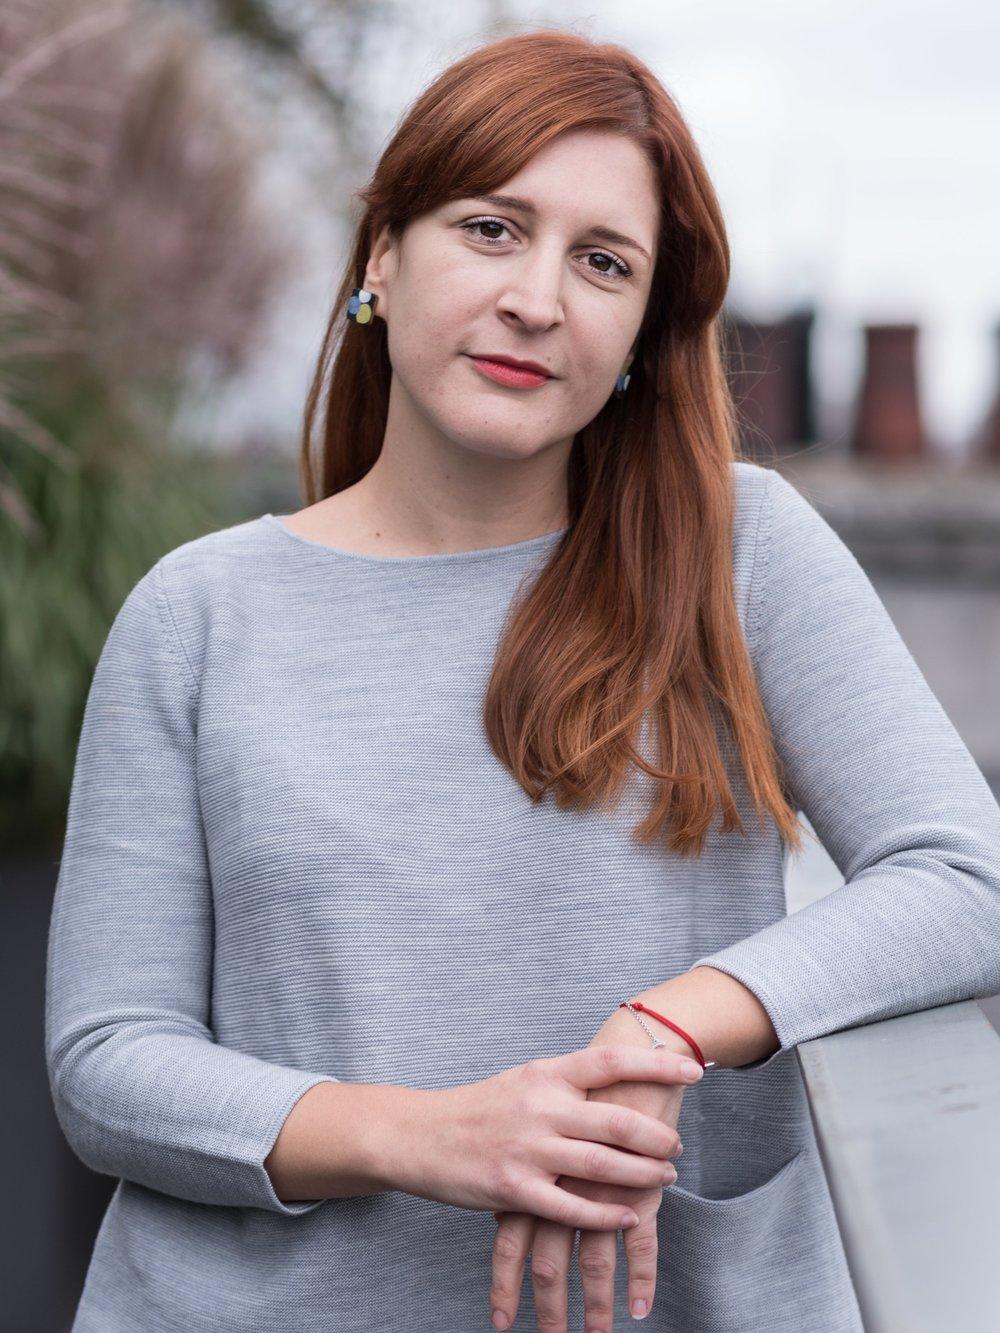 Renata Cuk - Nationality: CroatianLiving in: Barcelona, Spain